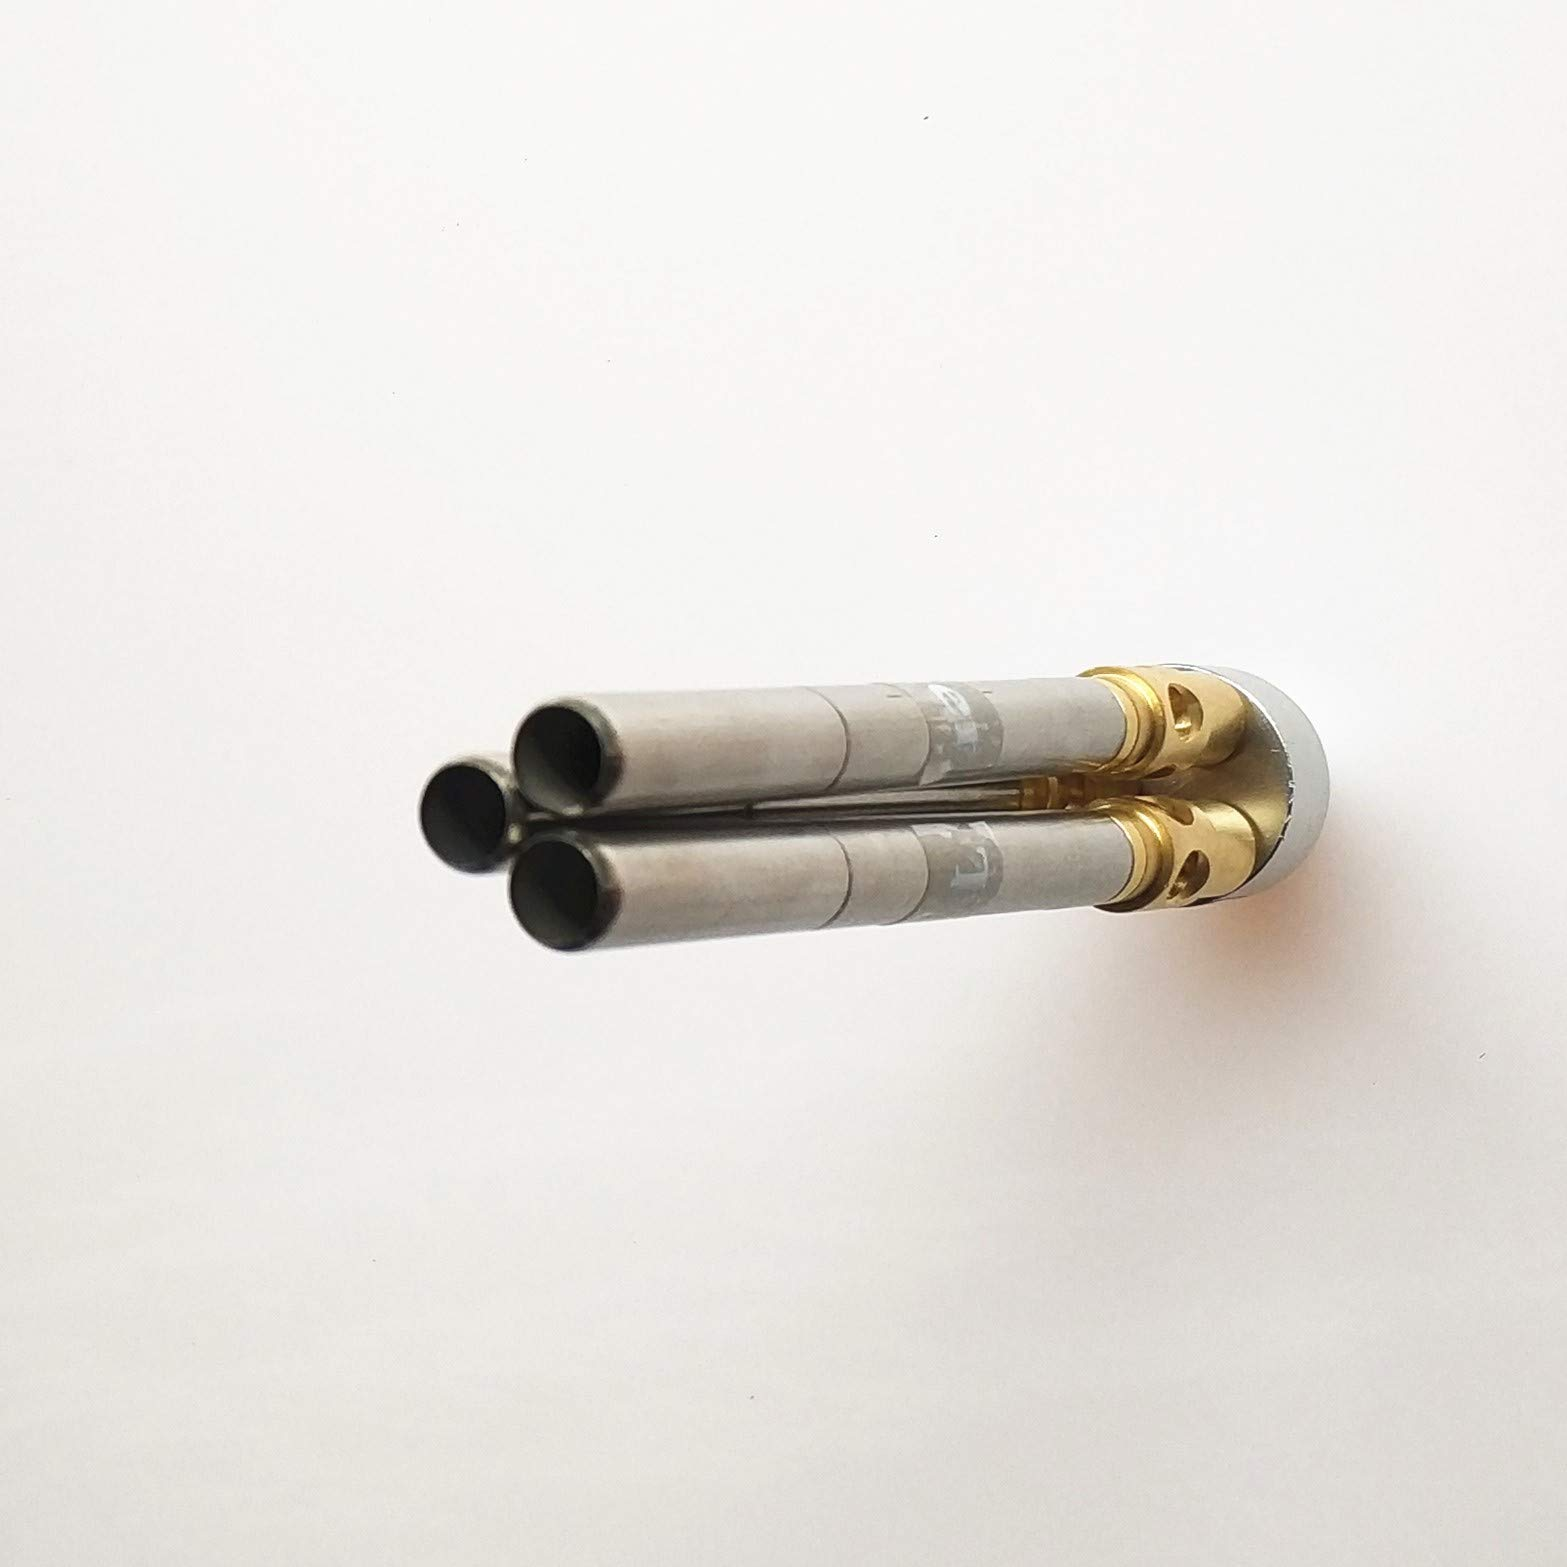 Mapp Gas Welding Torch Accessory, Flame Brazing Gun Welding Jewelry BBQ HVAC Plumbing Tip by TywelMaster (Image #2)